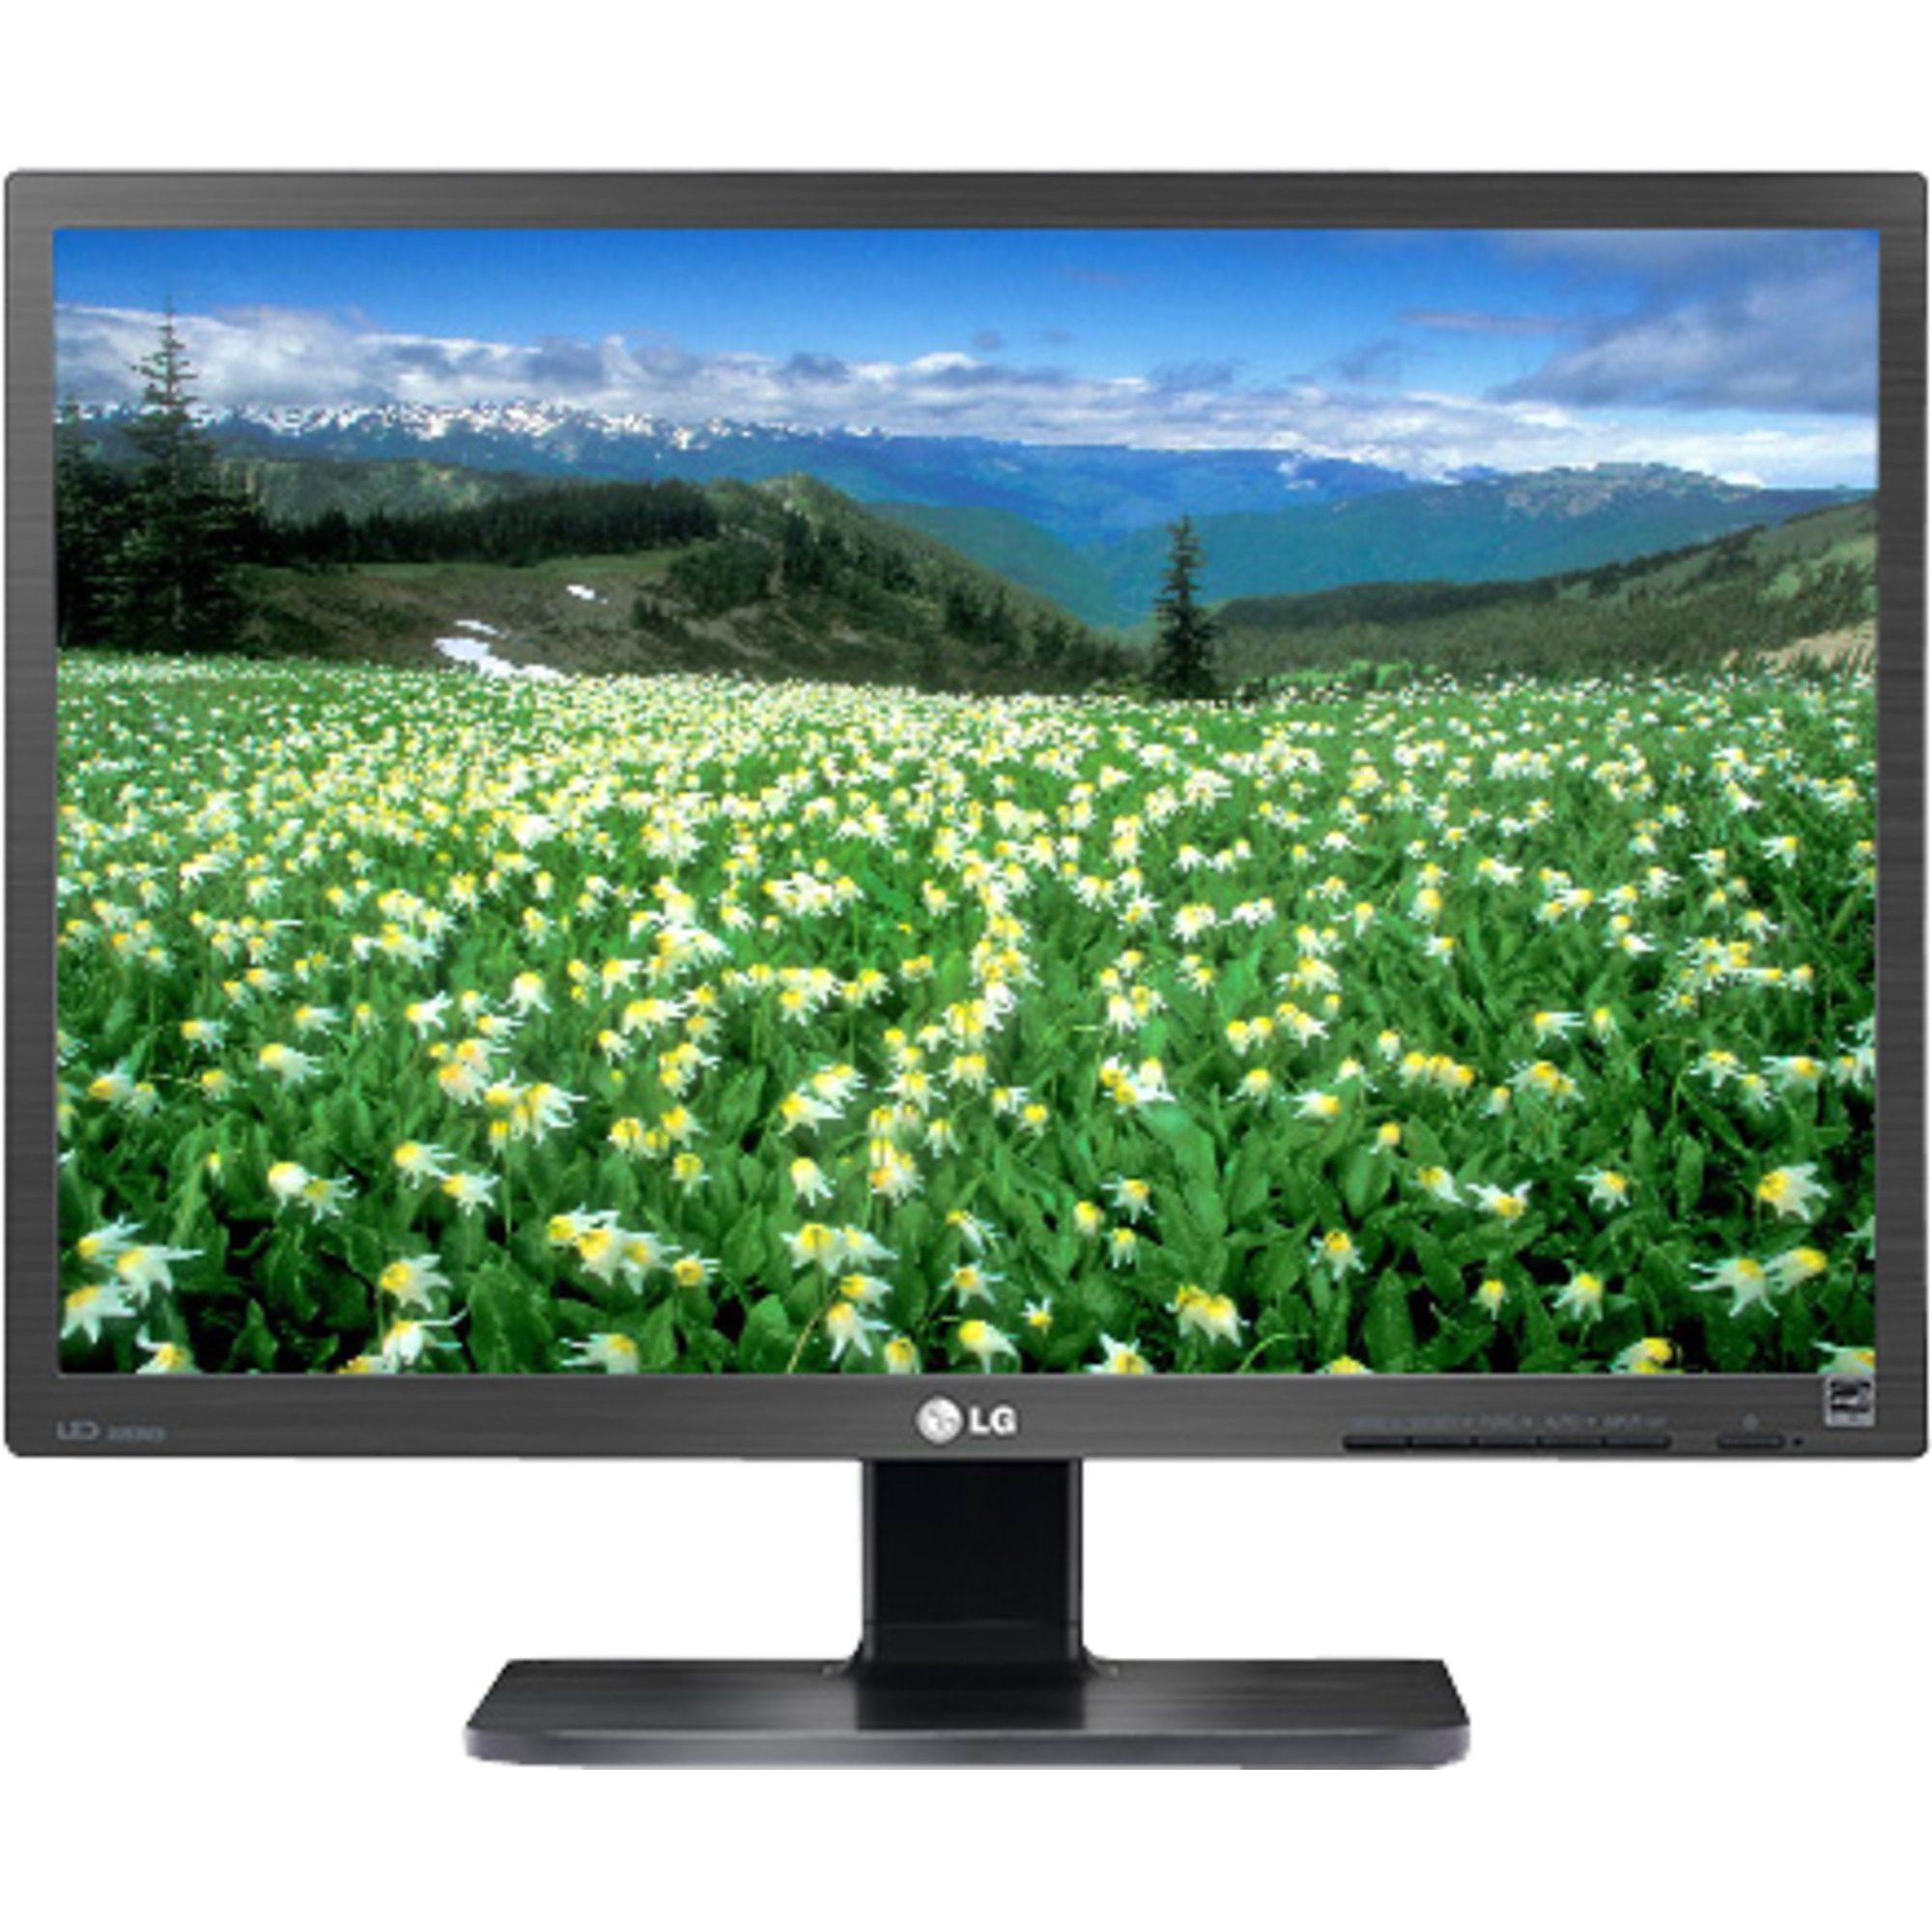 LG LED-Monitor »Flatron 24EB23PM-B«